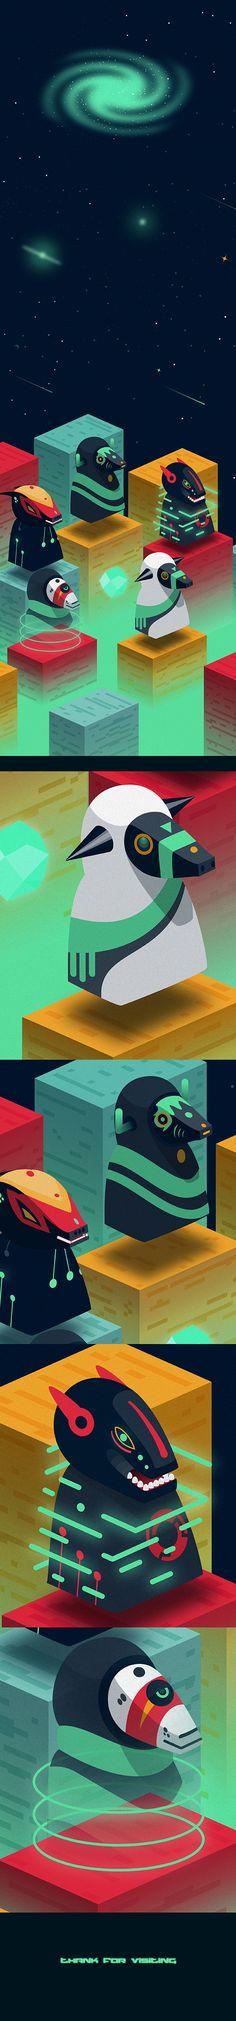 Phobos on Character Design Served